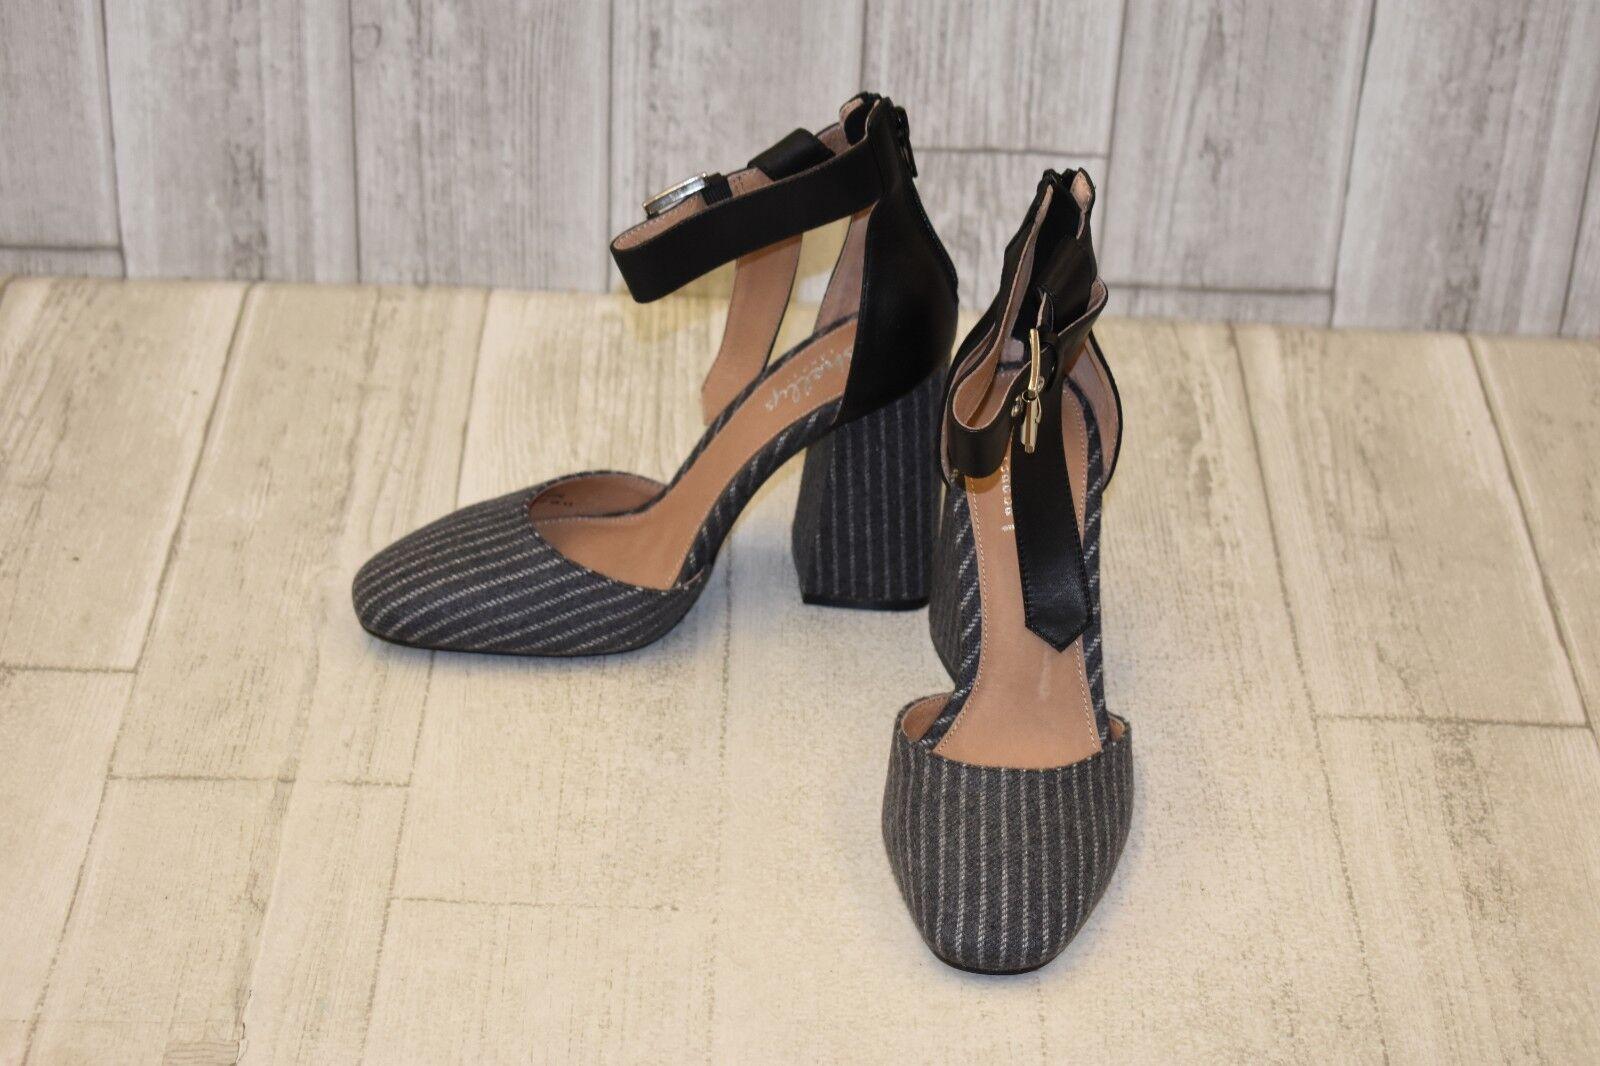 Shellys London Gillian Pump - Women's Size 6.5, Grey Pinstripe